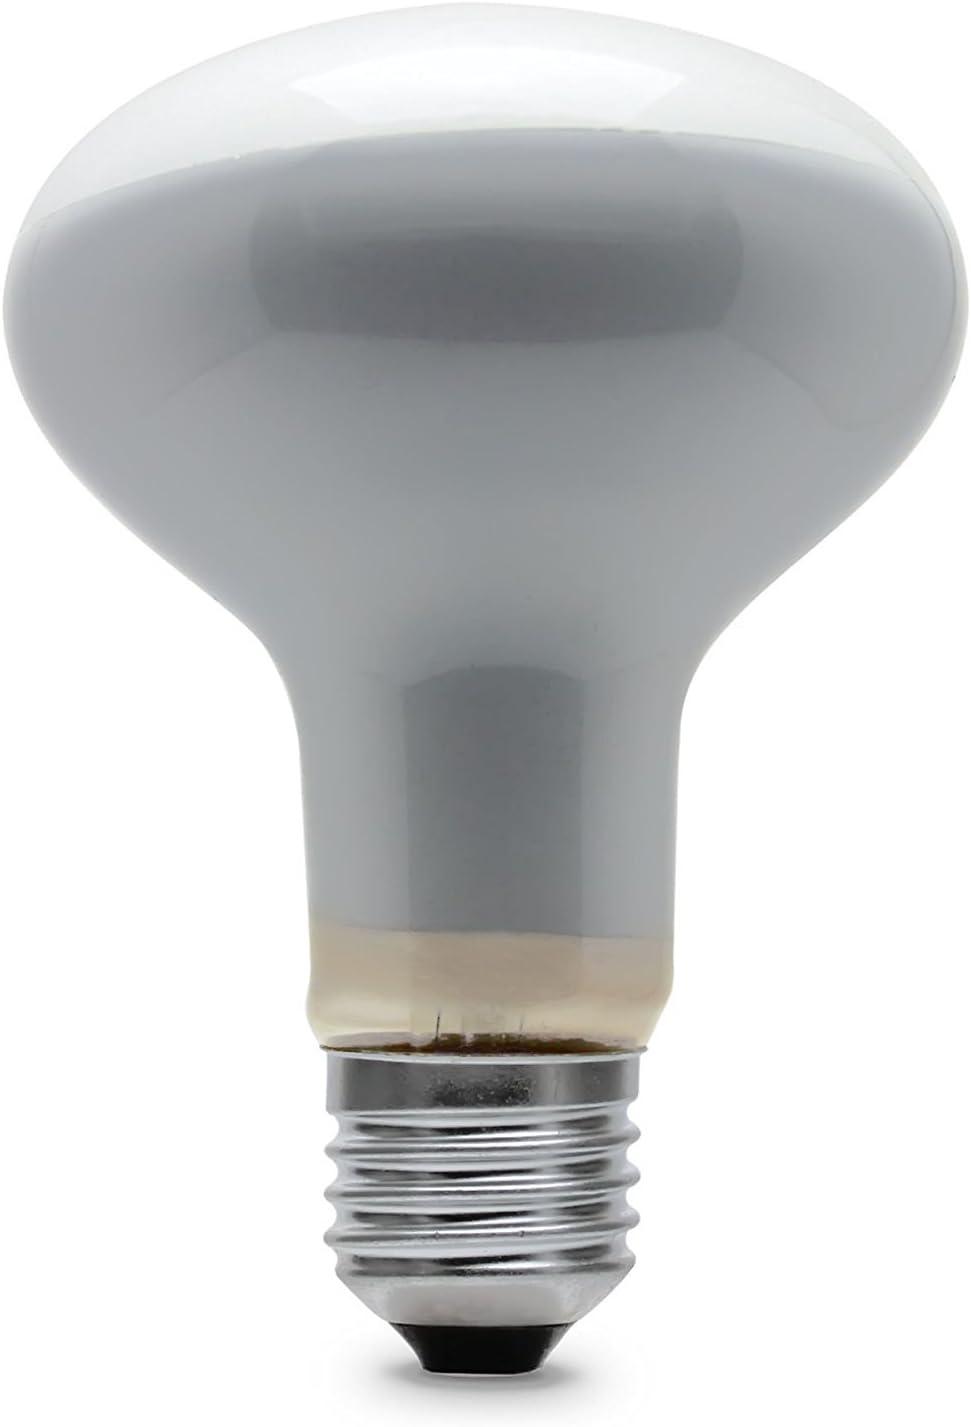 6x 60W Reflector R80 Dimmable Light bulbs lamp BC B22 Bayonet Cap GE Branded